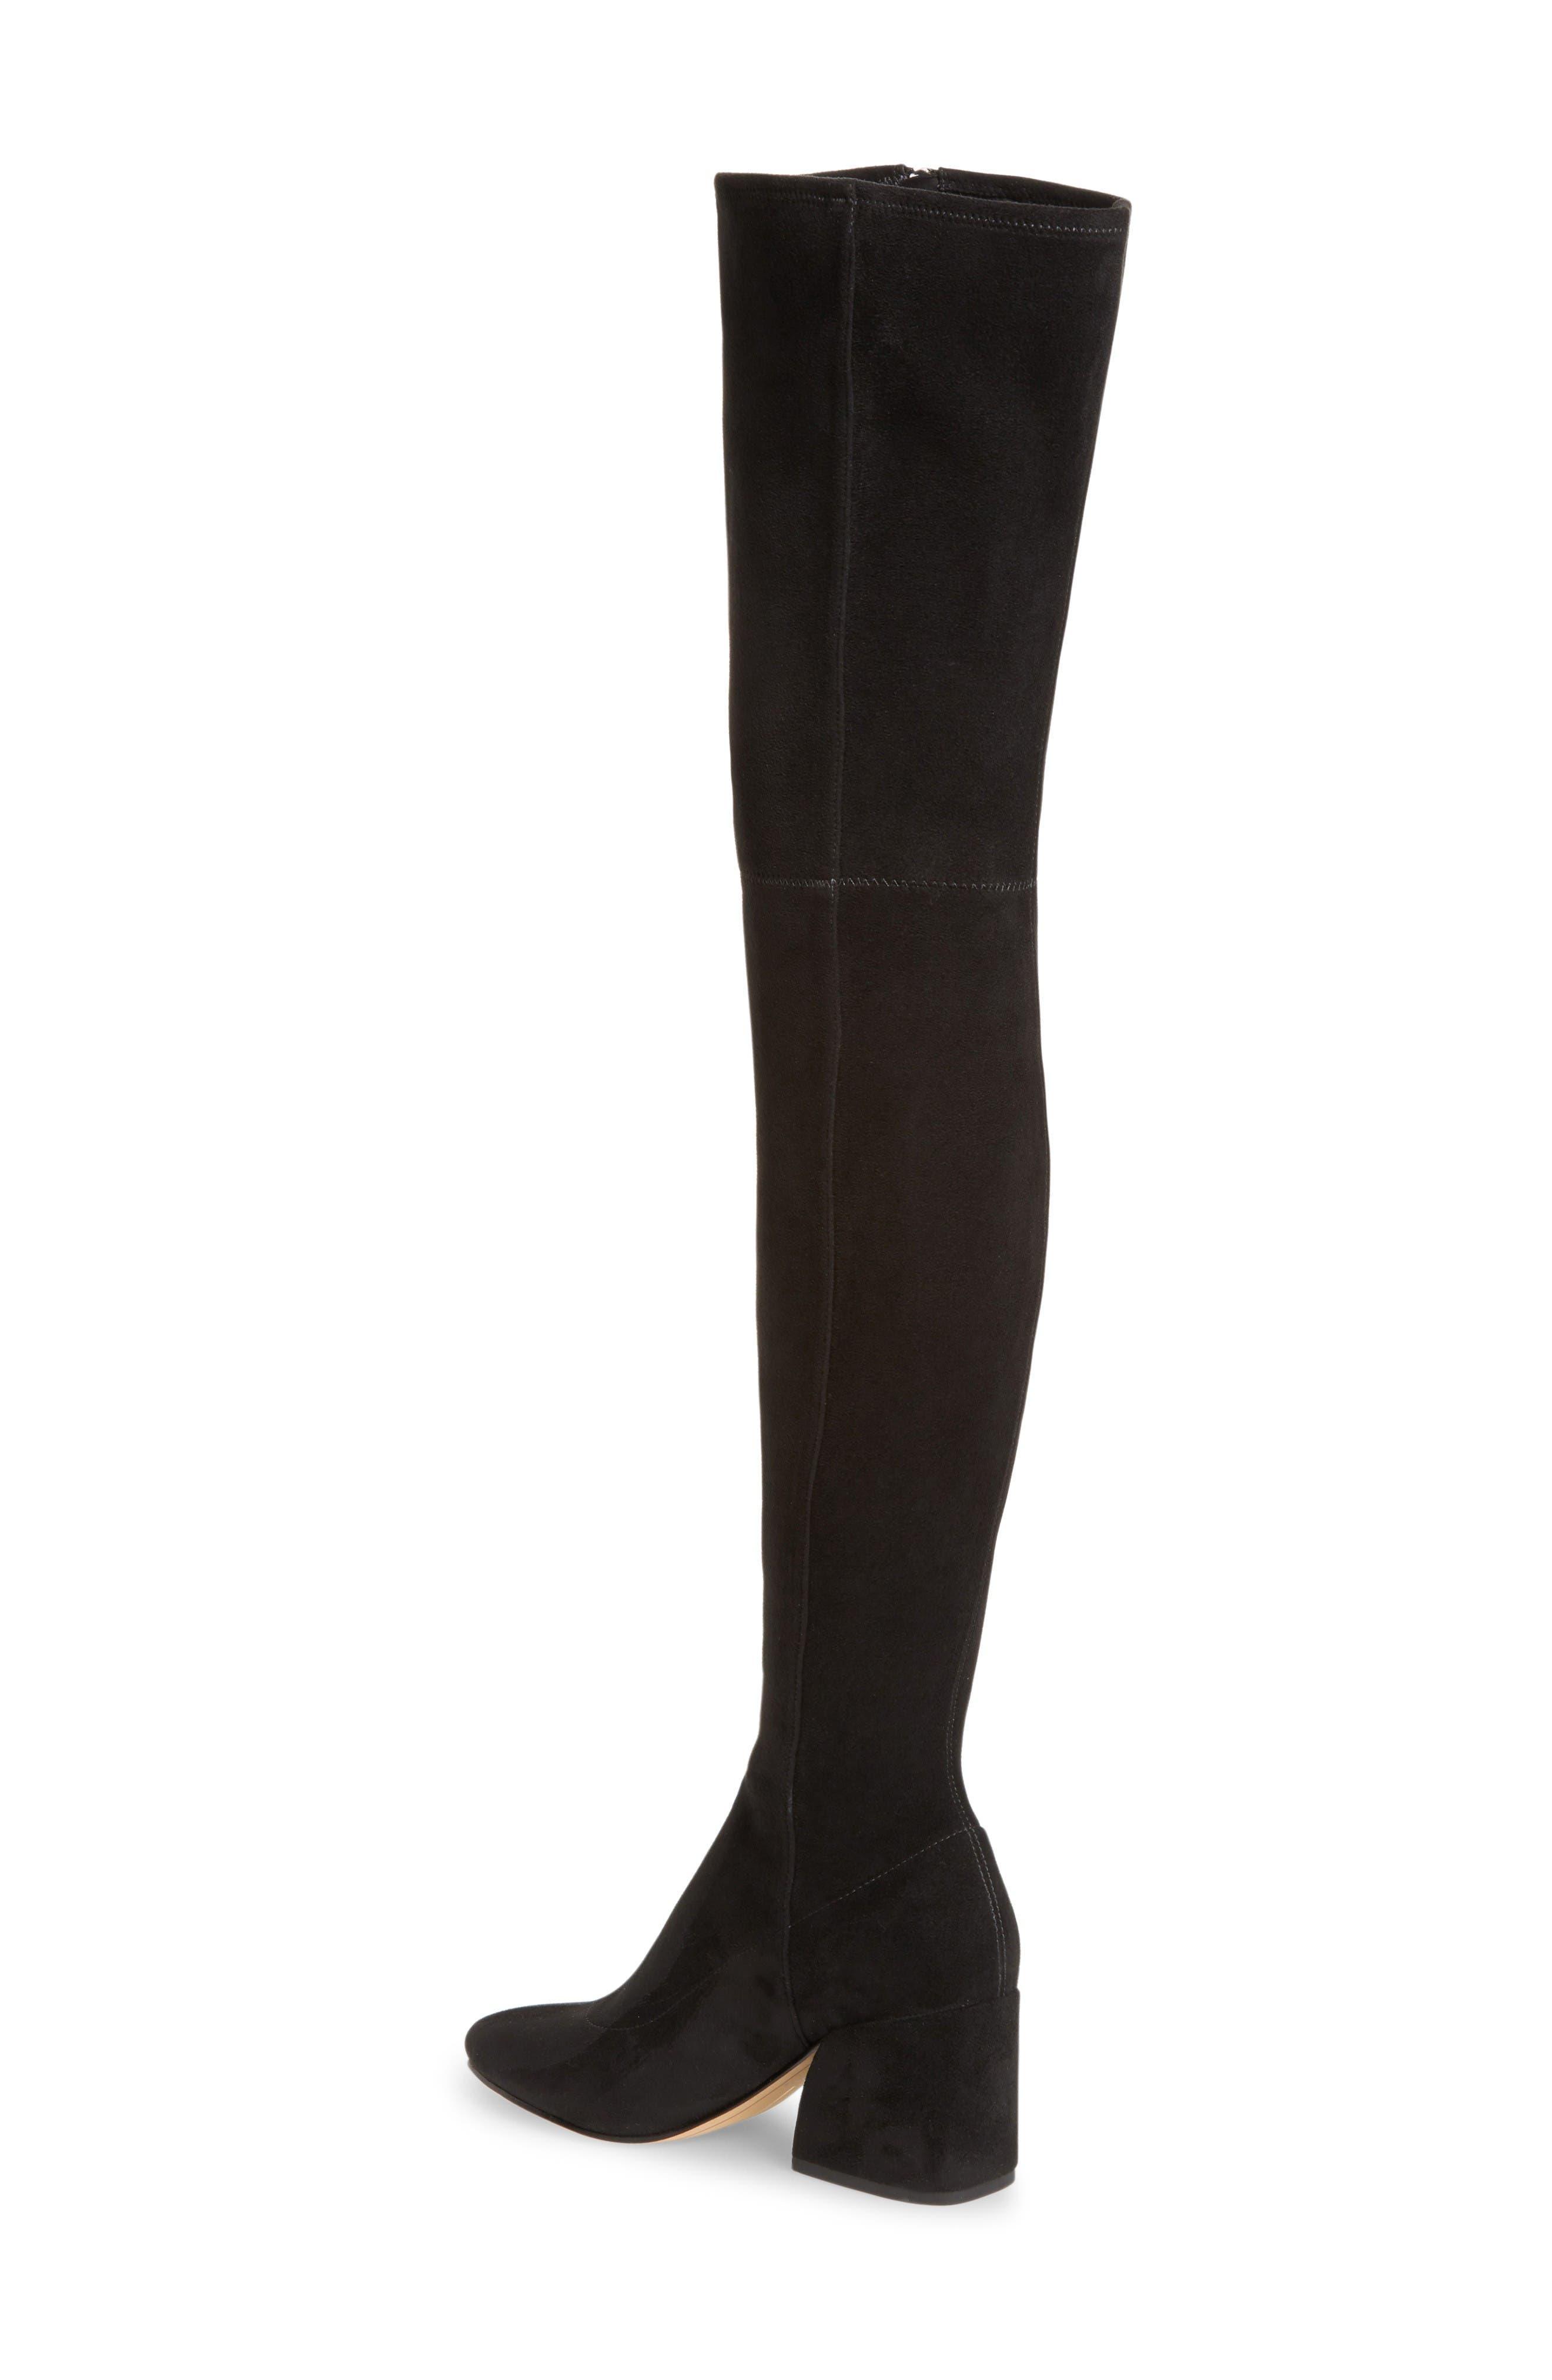 Vix Thigh High Boot,                             Alternate thumbnail 2, color,                             Black Suede